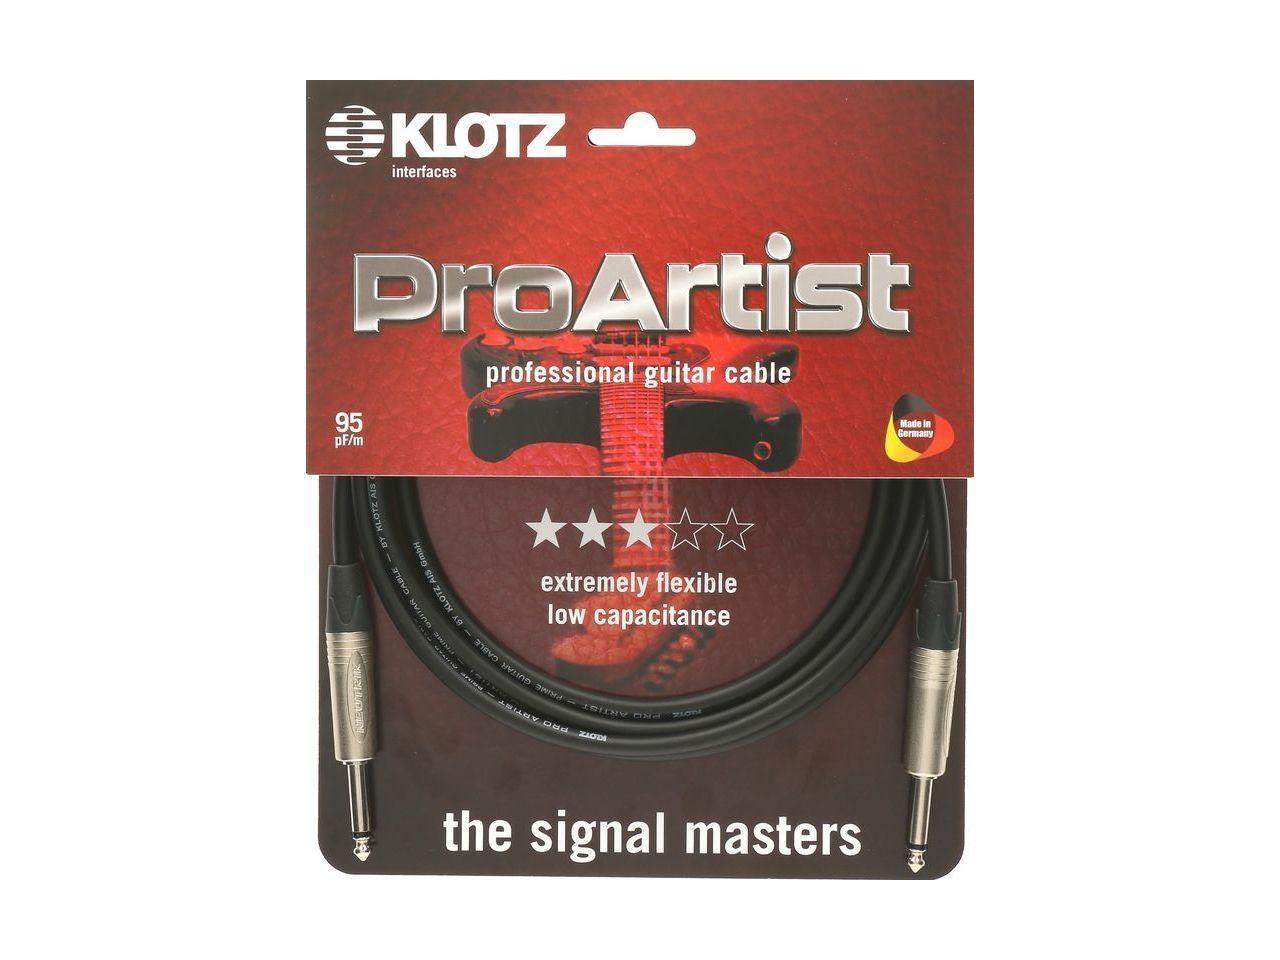 Klotz Gitarrenkabel Pro Artist 6m, 6,3mm Klinke/Klinke PRON060PP